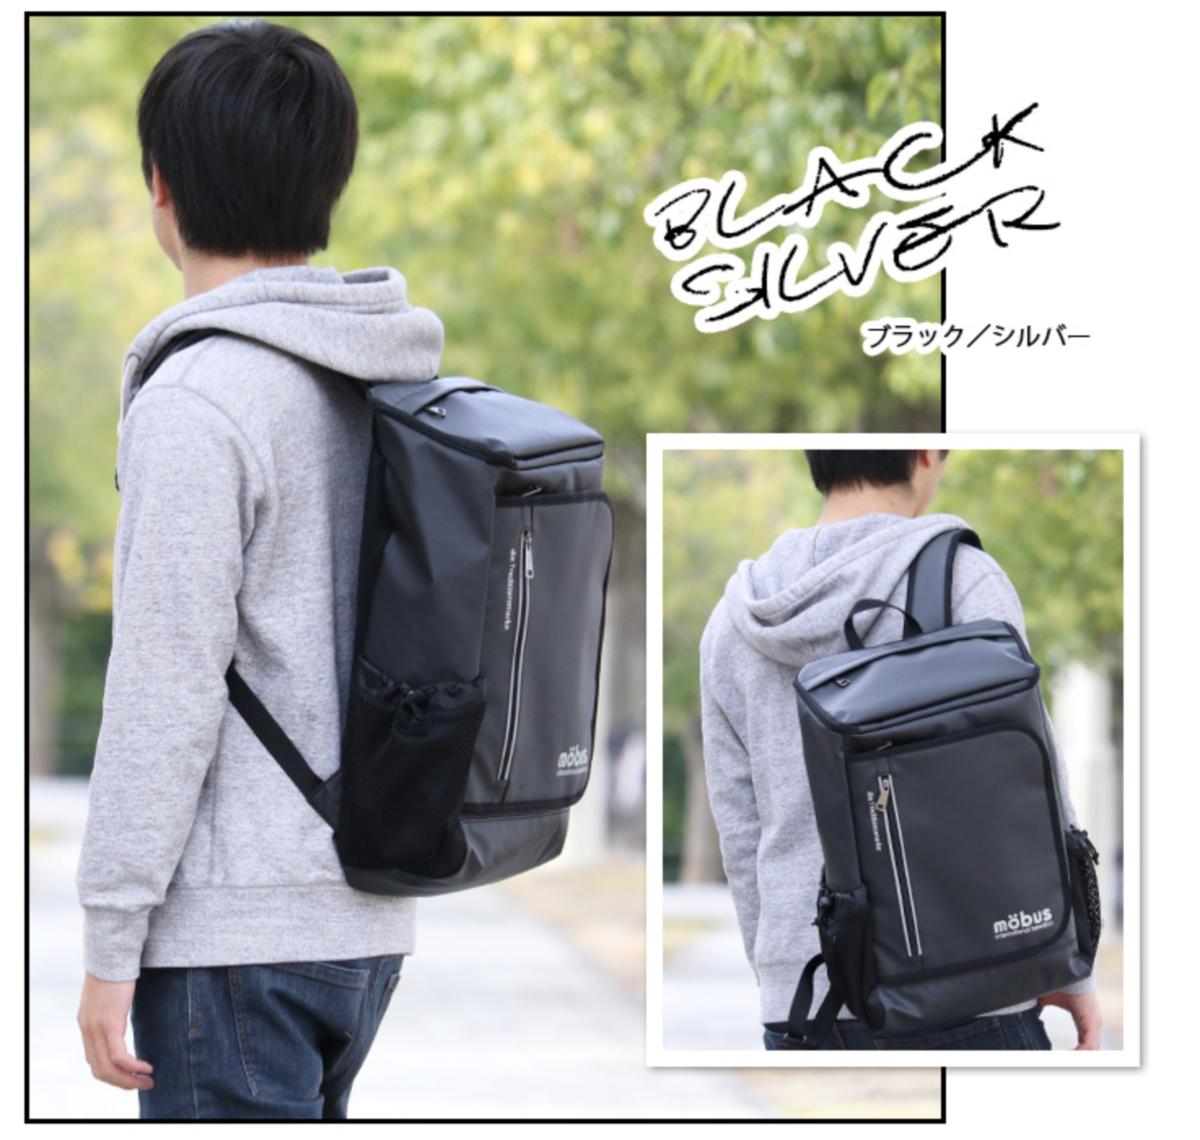 f:id:thebackpack:20190830205420p:plain